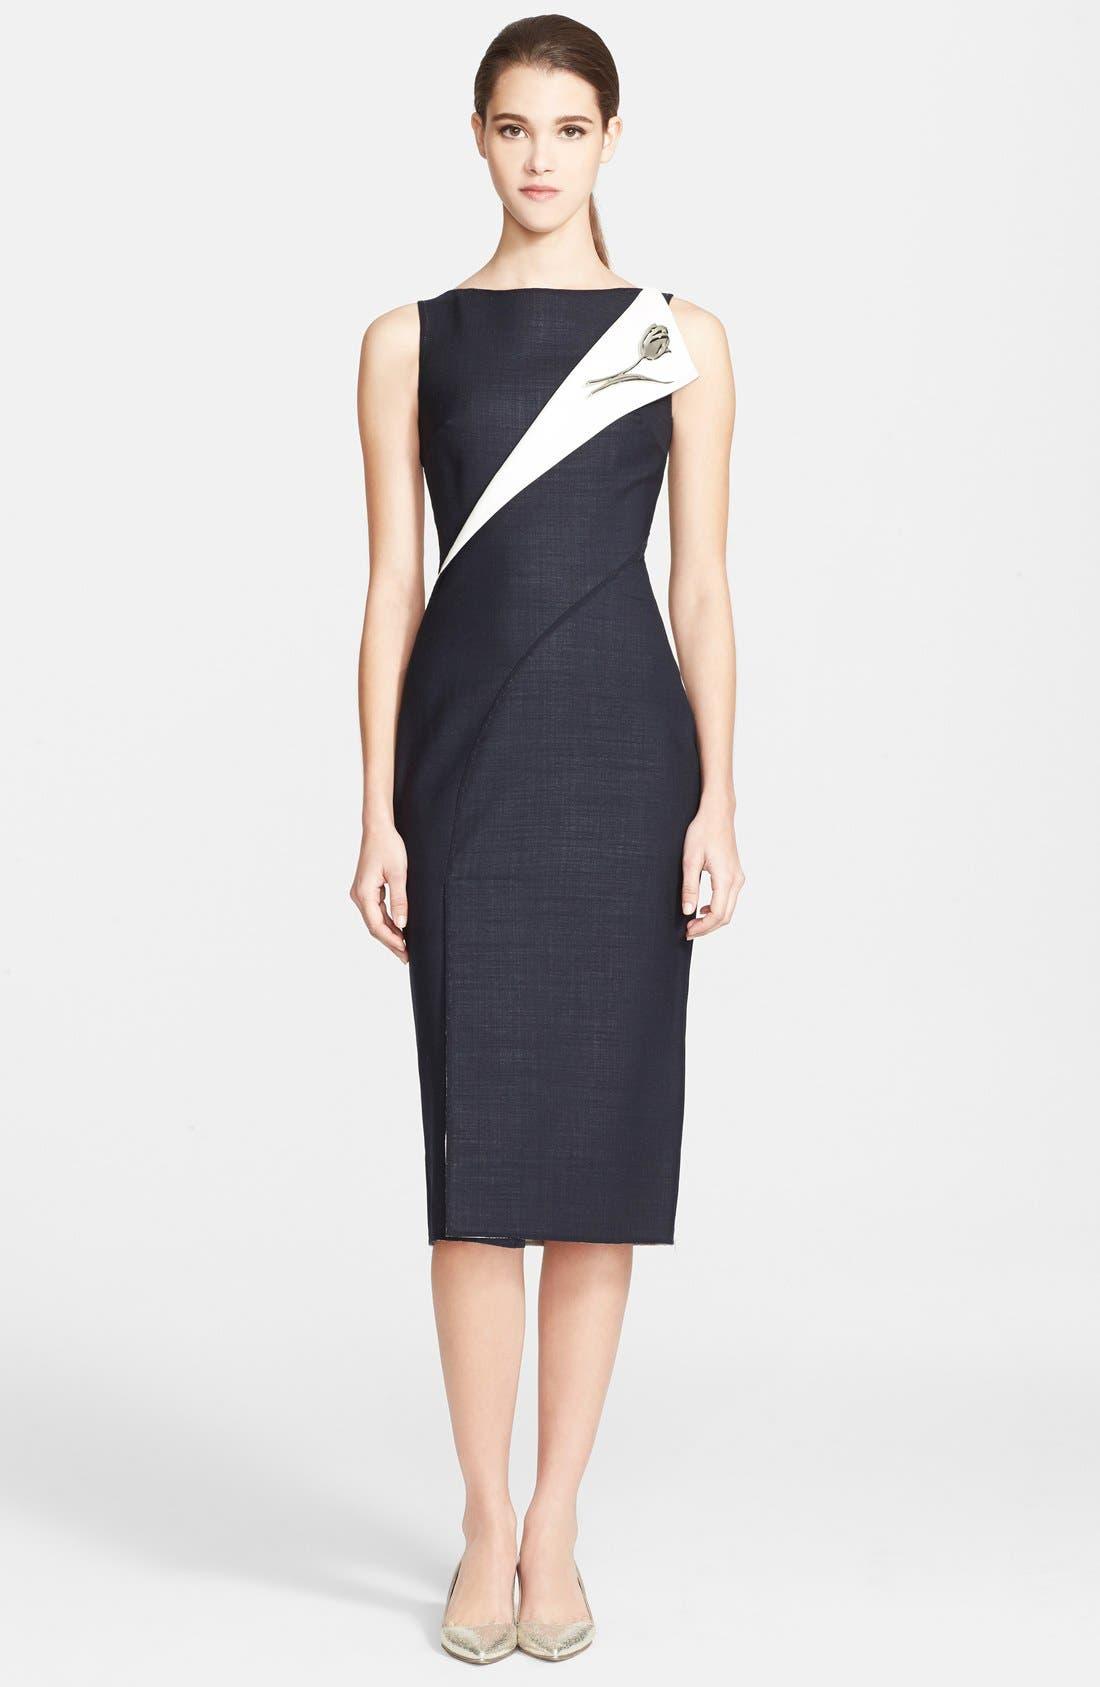 Alternate Image 1 Selected - Oscar de la Renta Folded Double-Face Wool Blend Pencil Dress